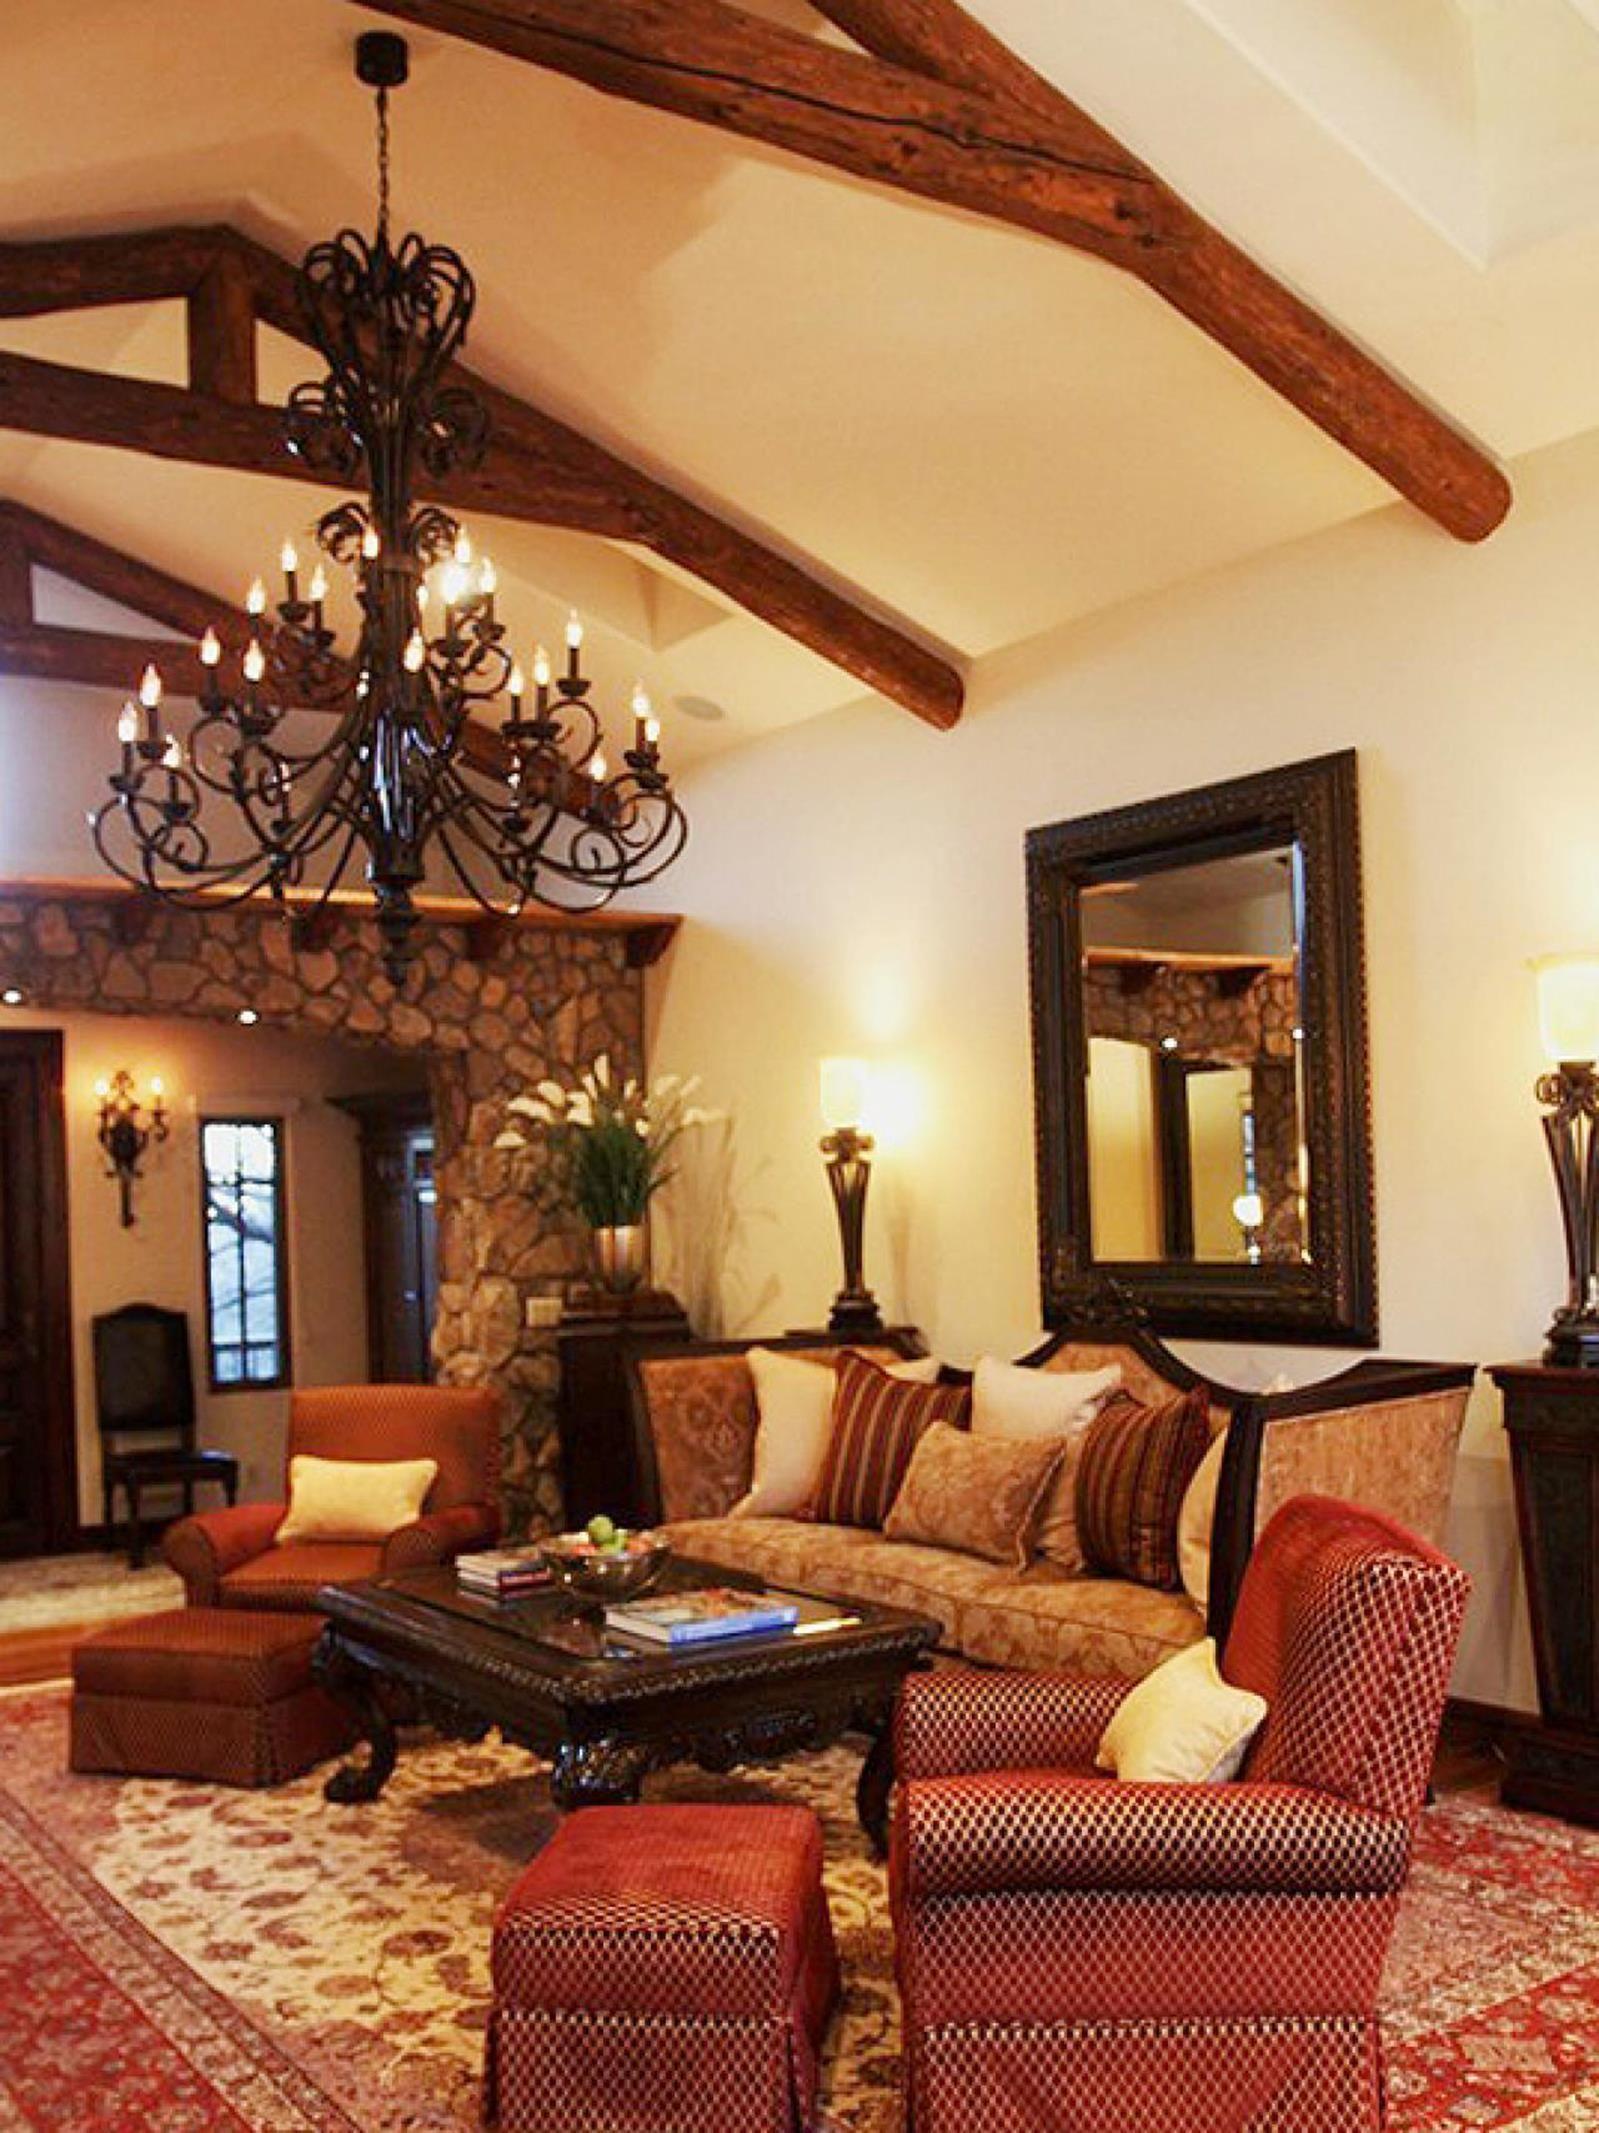 30+ Inspiring Spanish Style Decorating Living Room Ideas